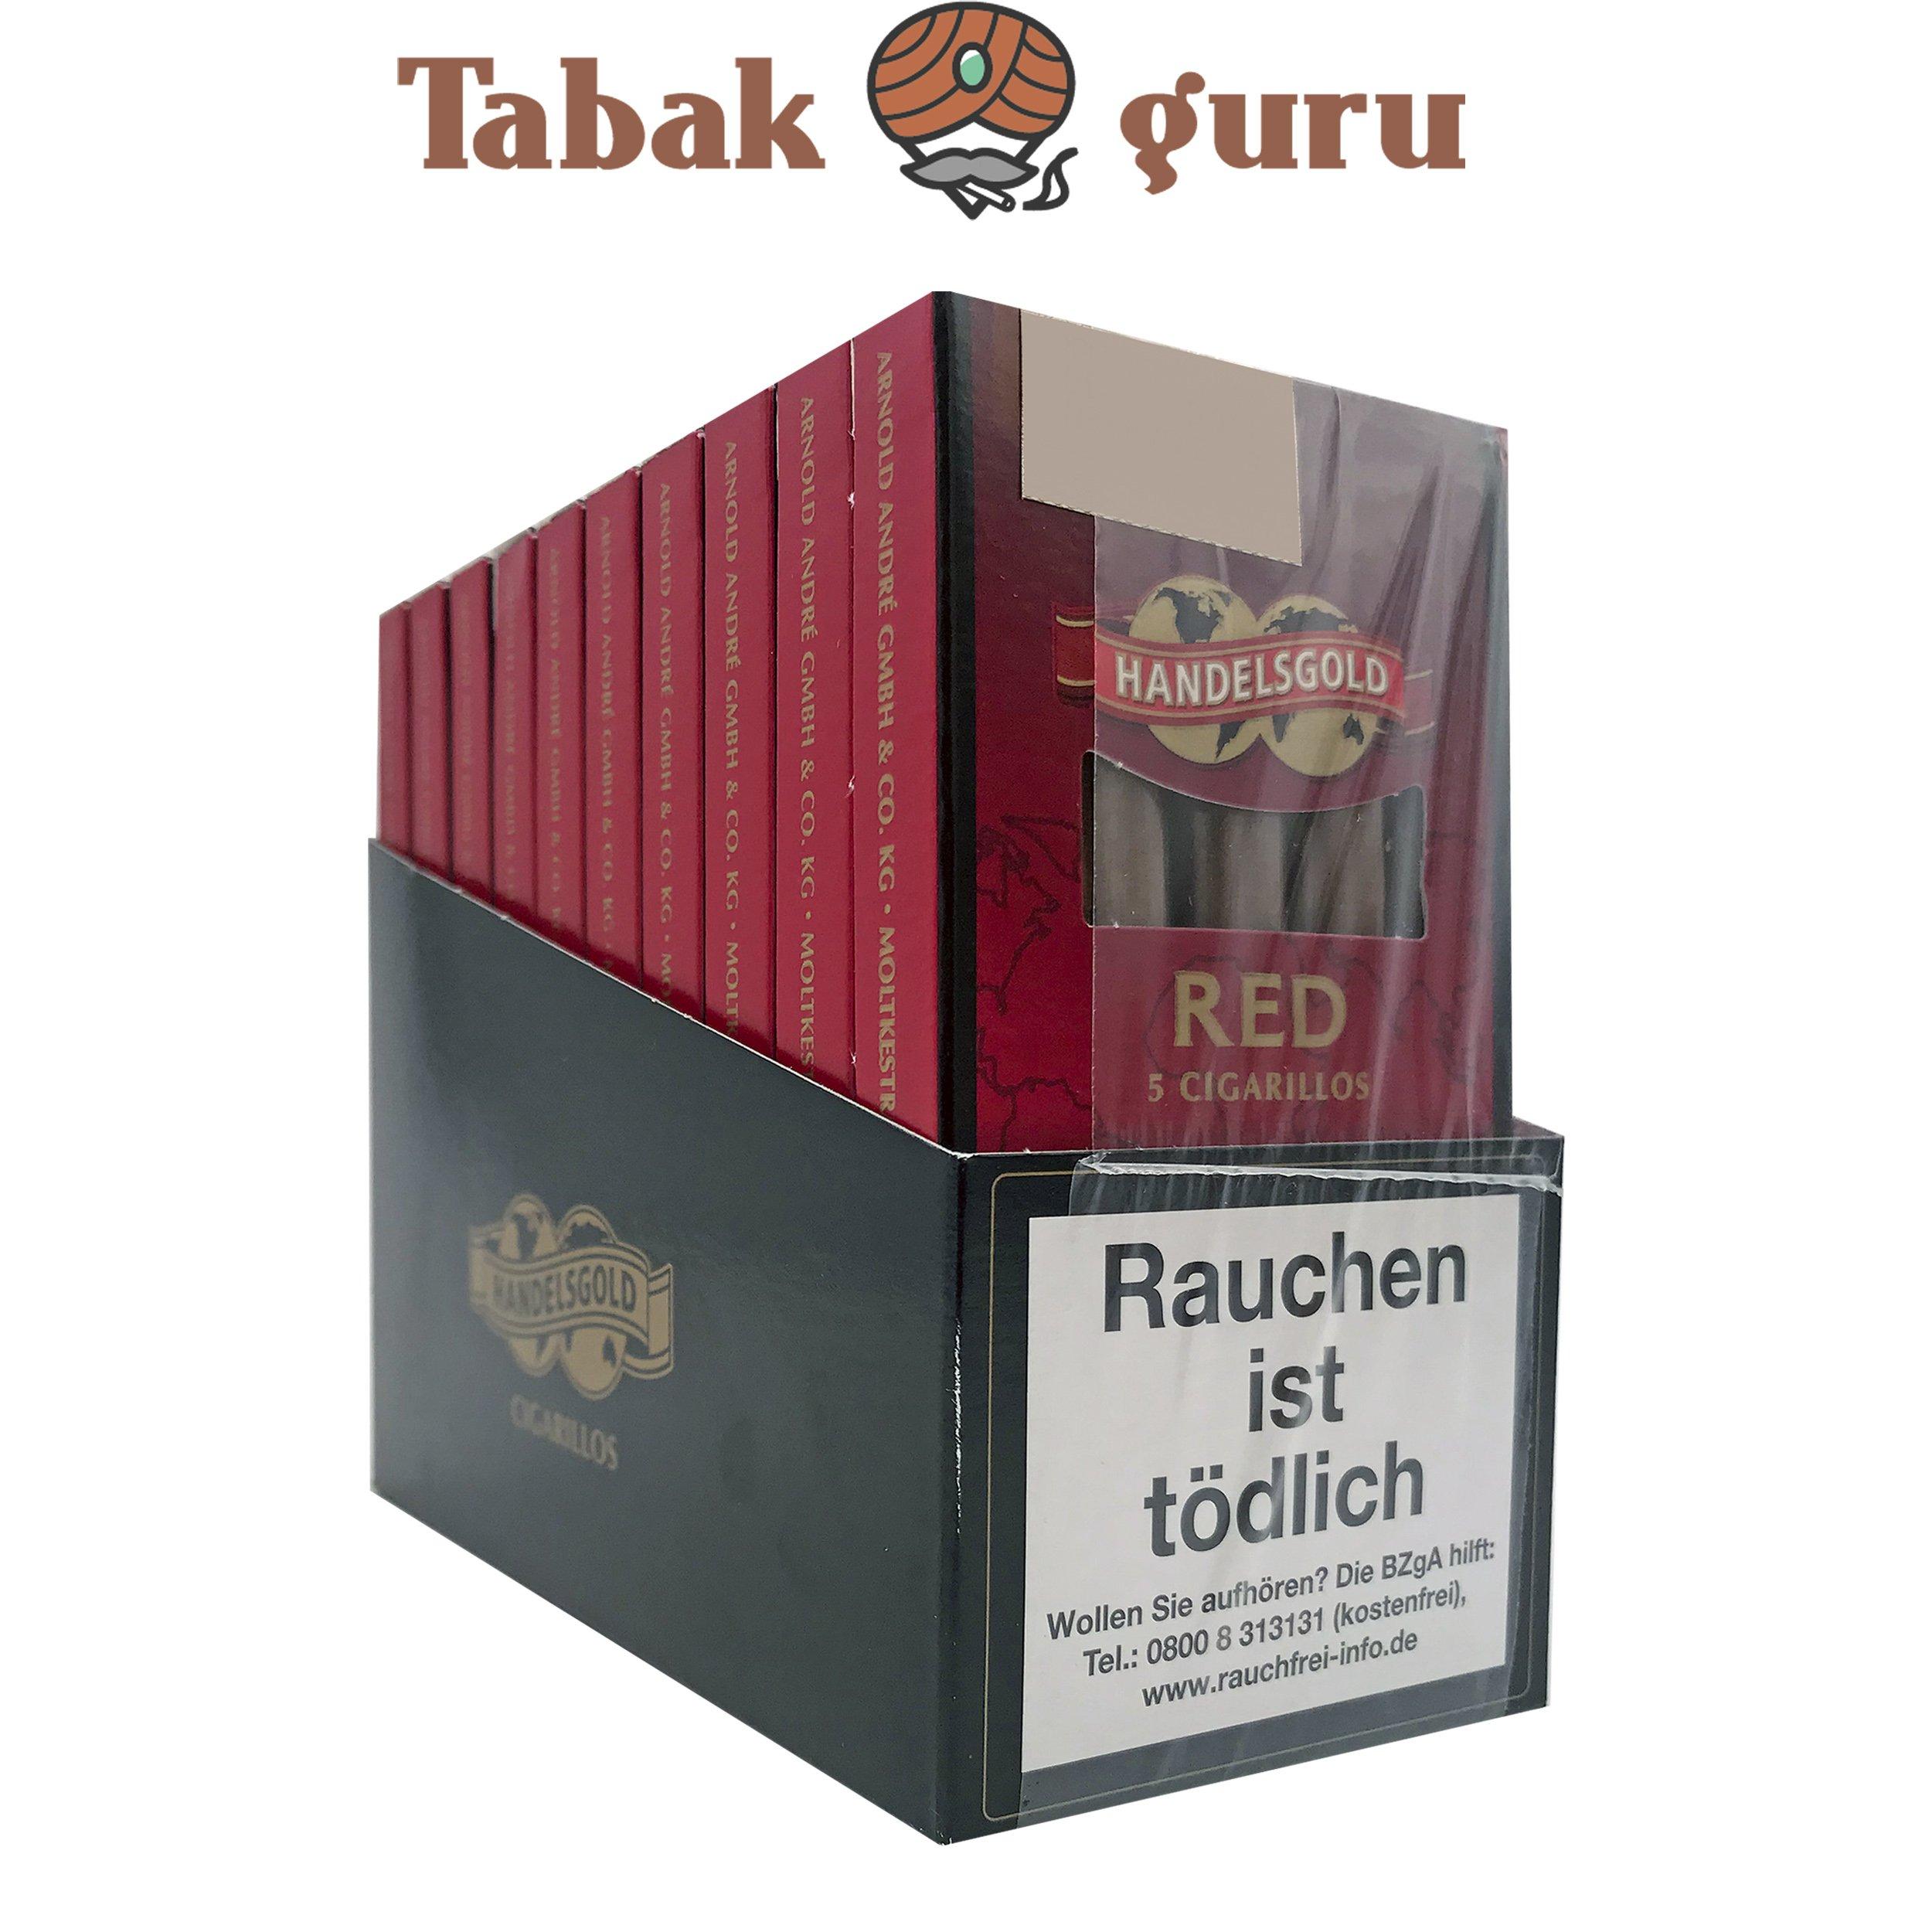 10x Handelsgold No. 213 Red Filterzigarillos à 5 Stück